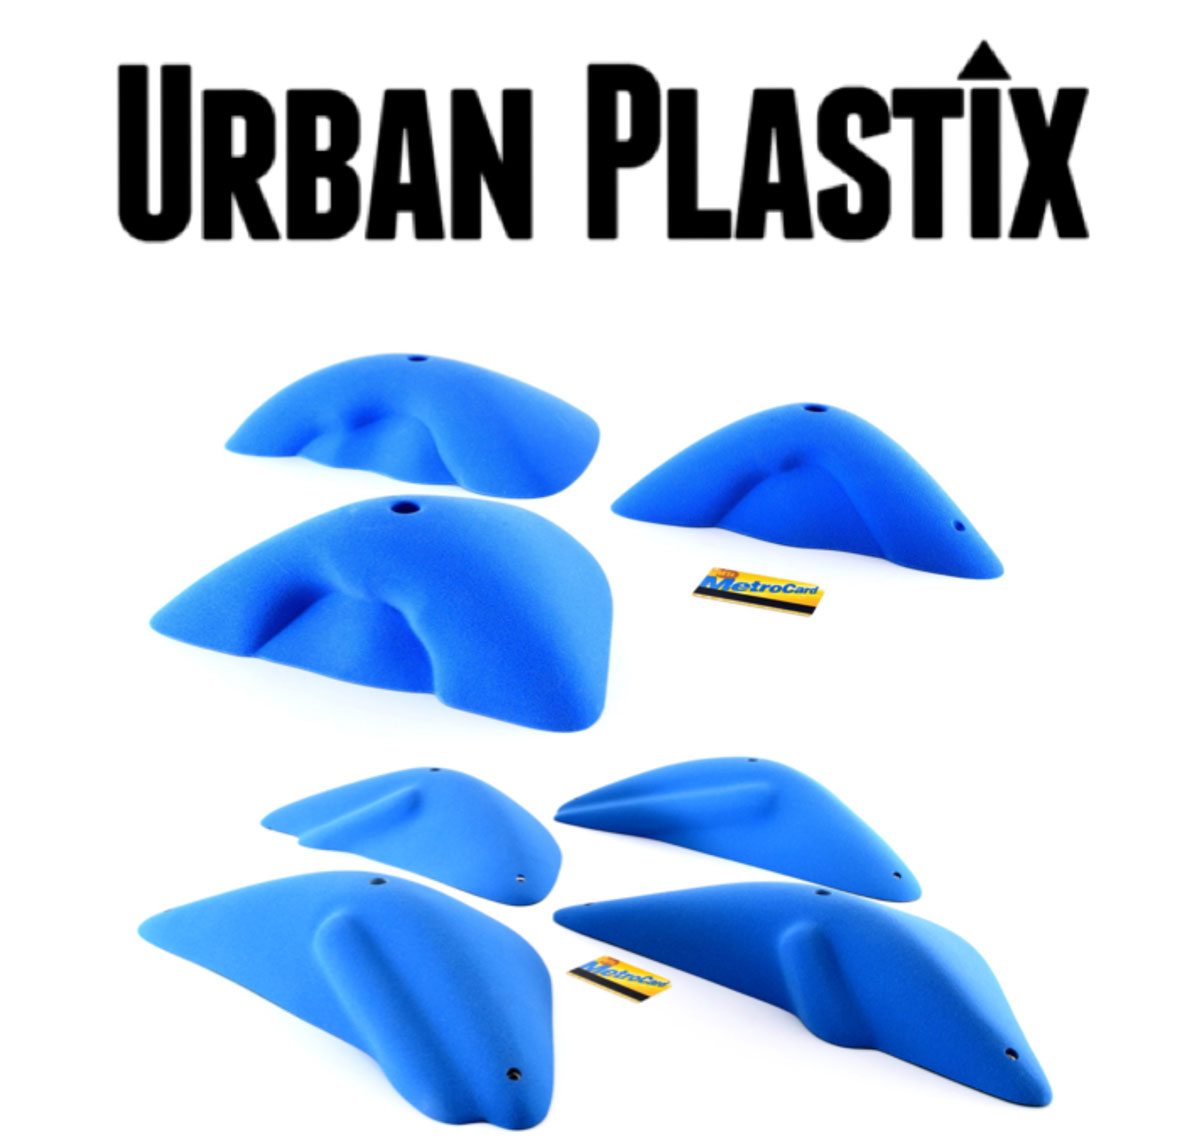 Urban Plastix